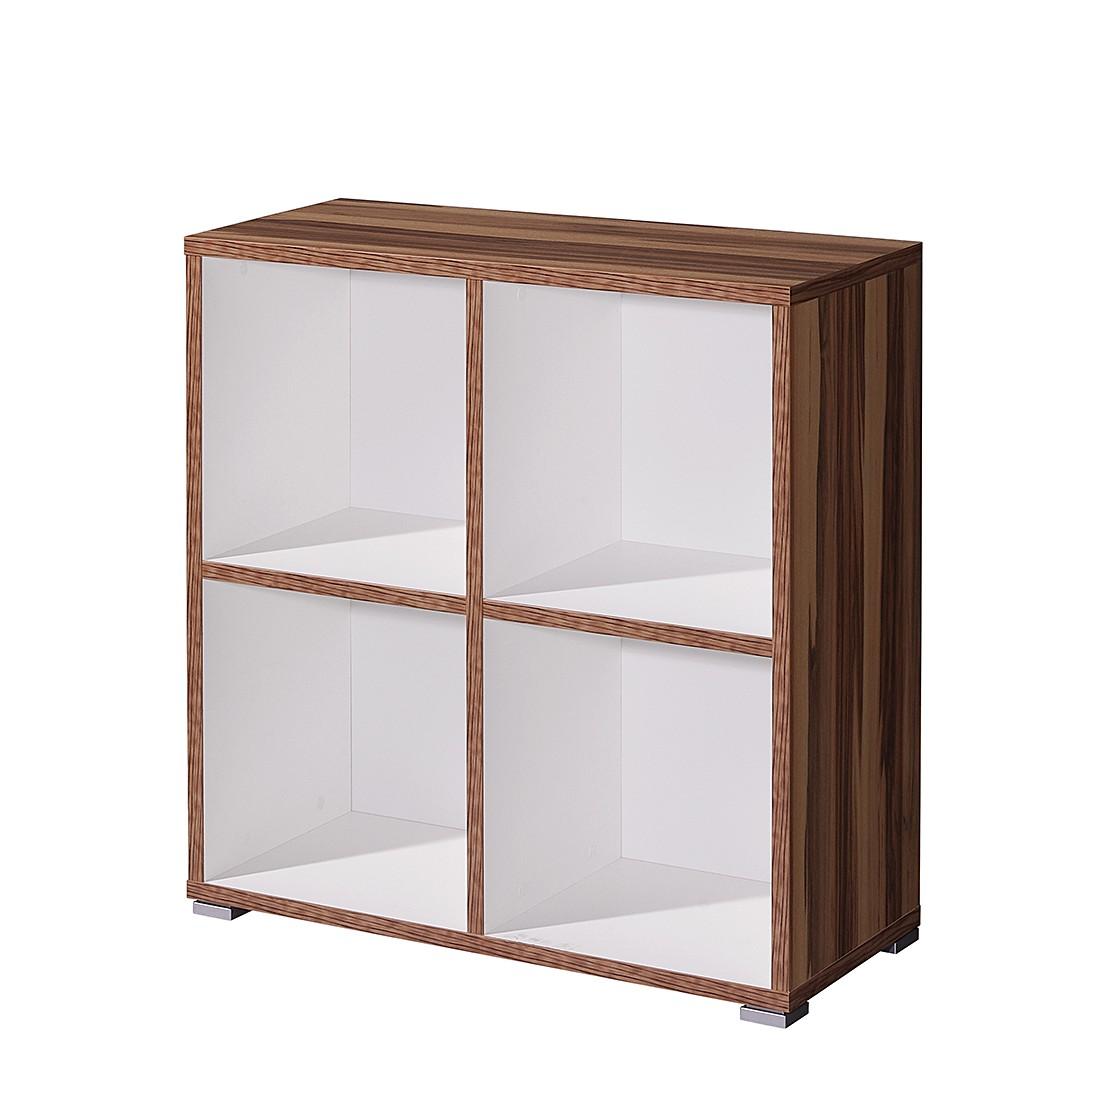 regal cube klein baltimore nussbaum wei top square. Black Bedroom Furniture Sets. Home Design Ideas